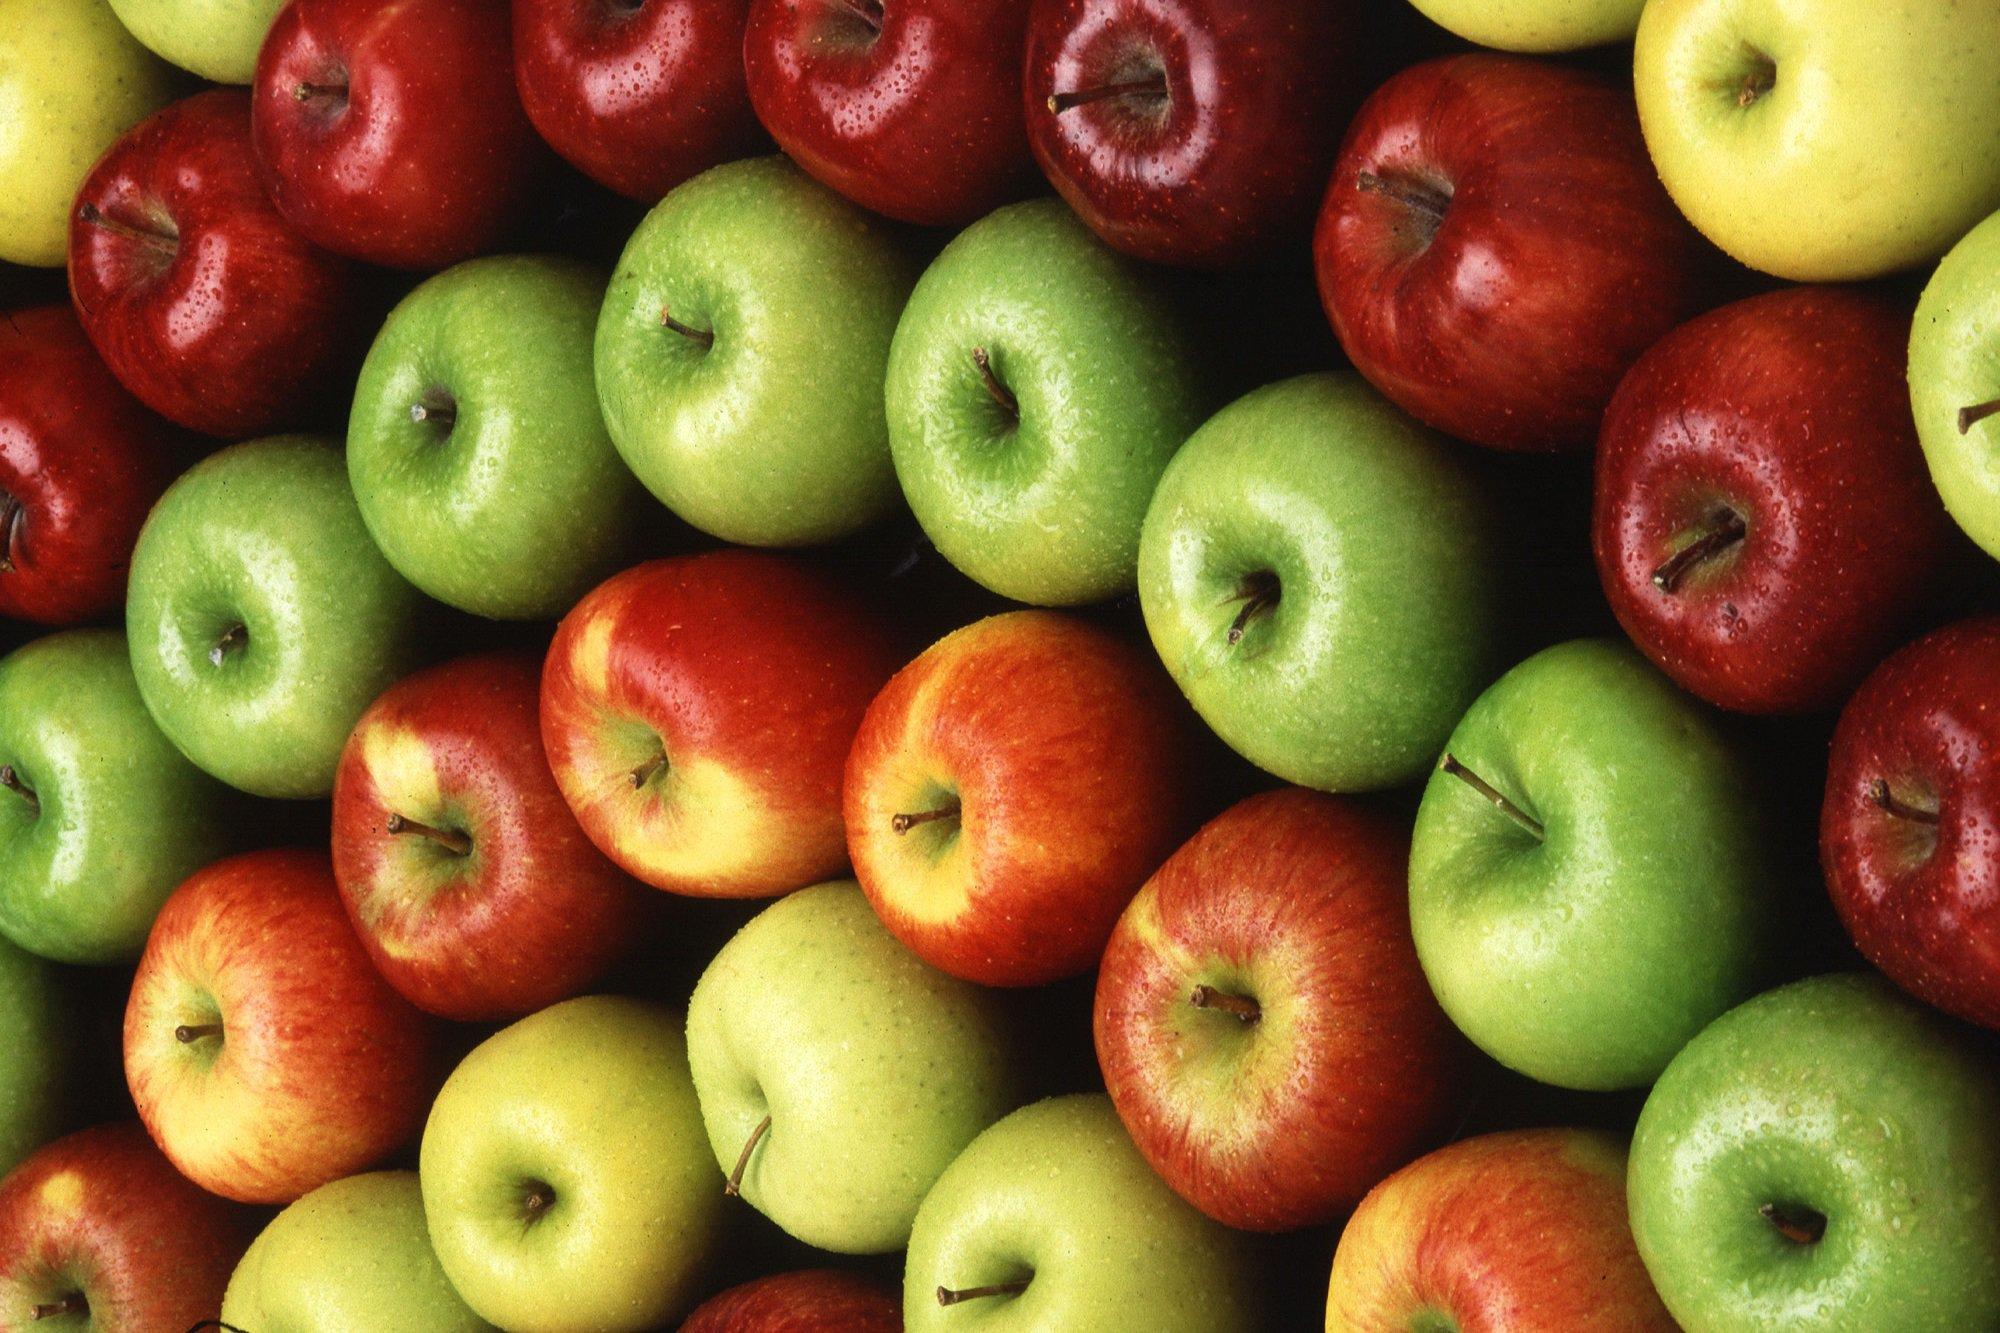 Ad aprile parliamo di mele gluten free travel and living - Immagini stampabili di mele ...